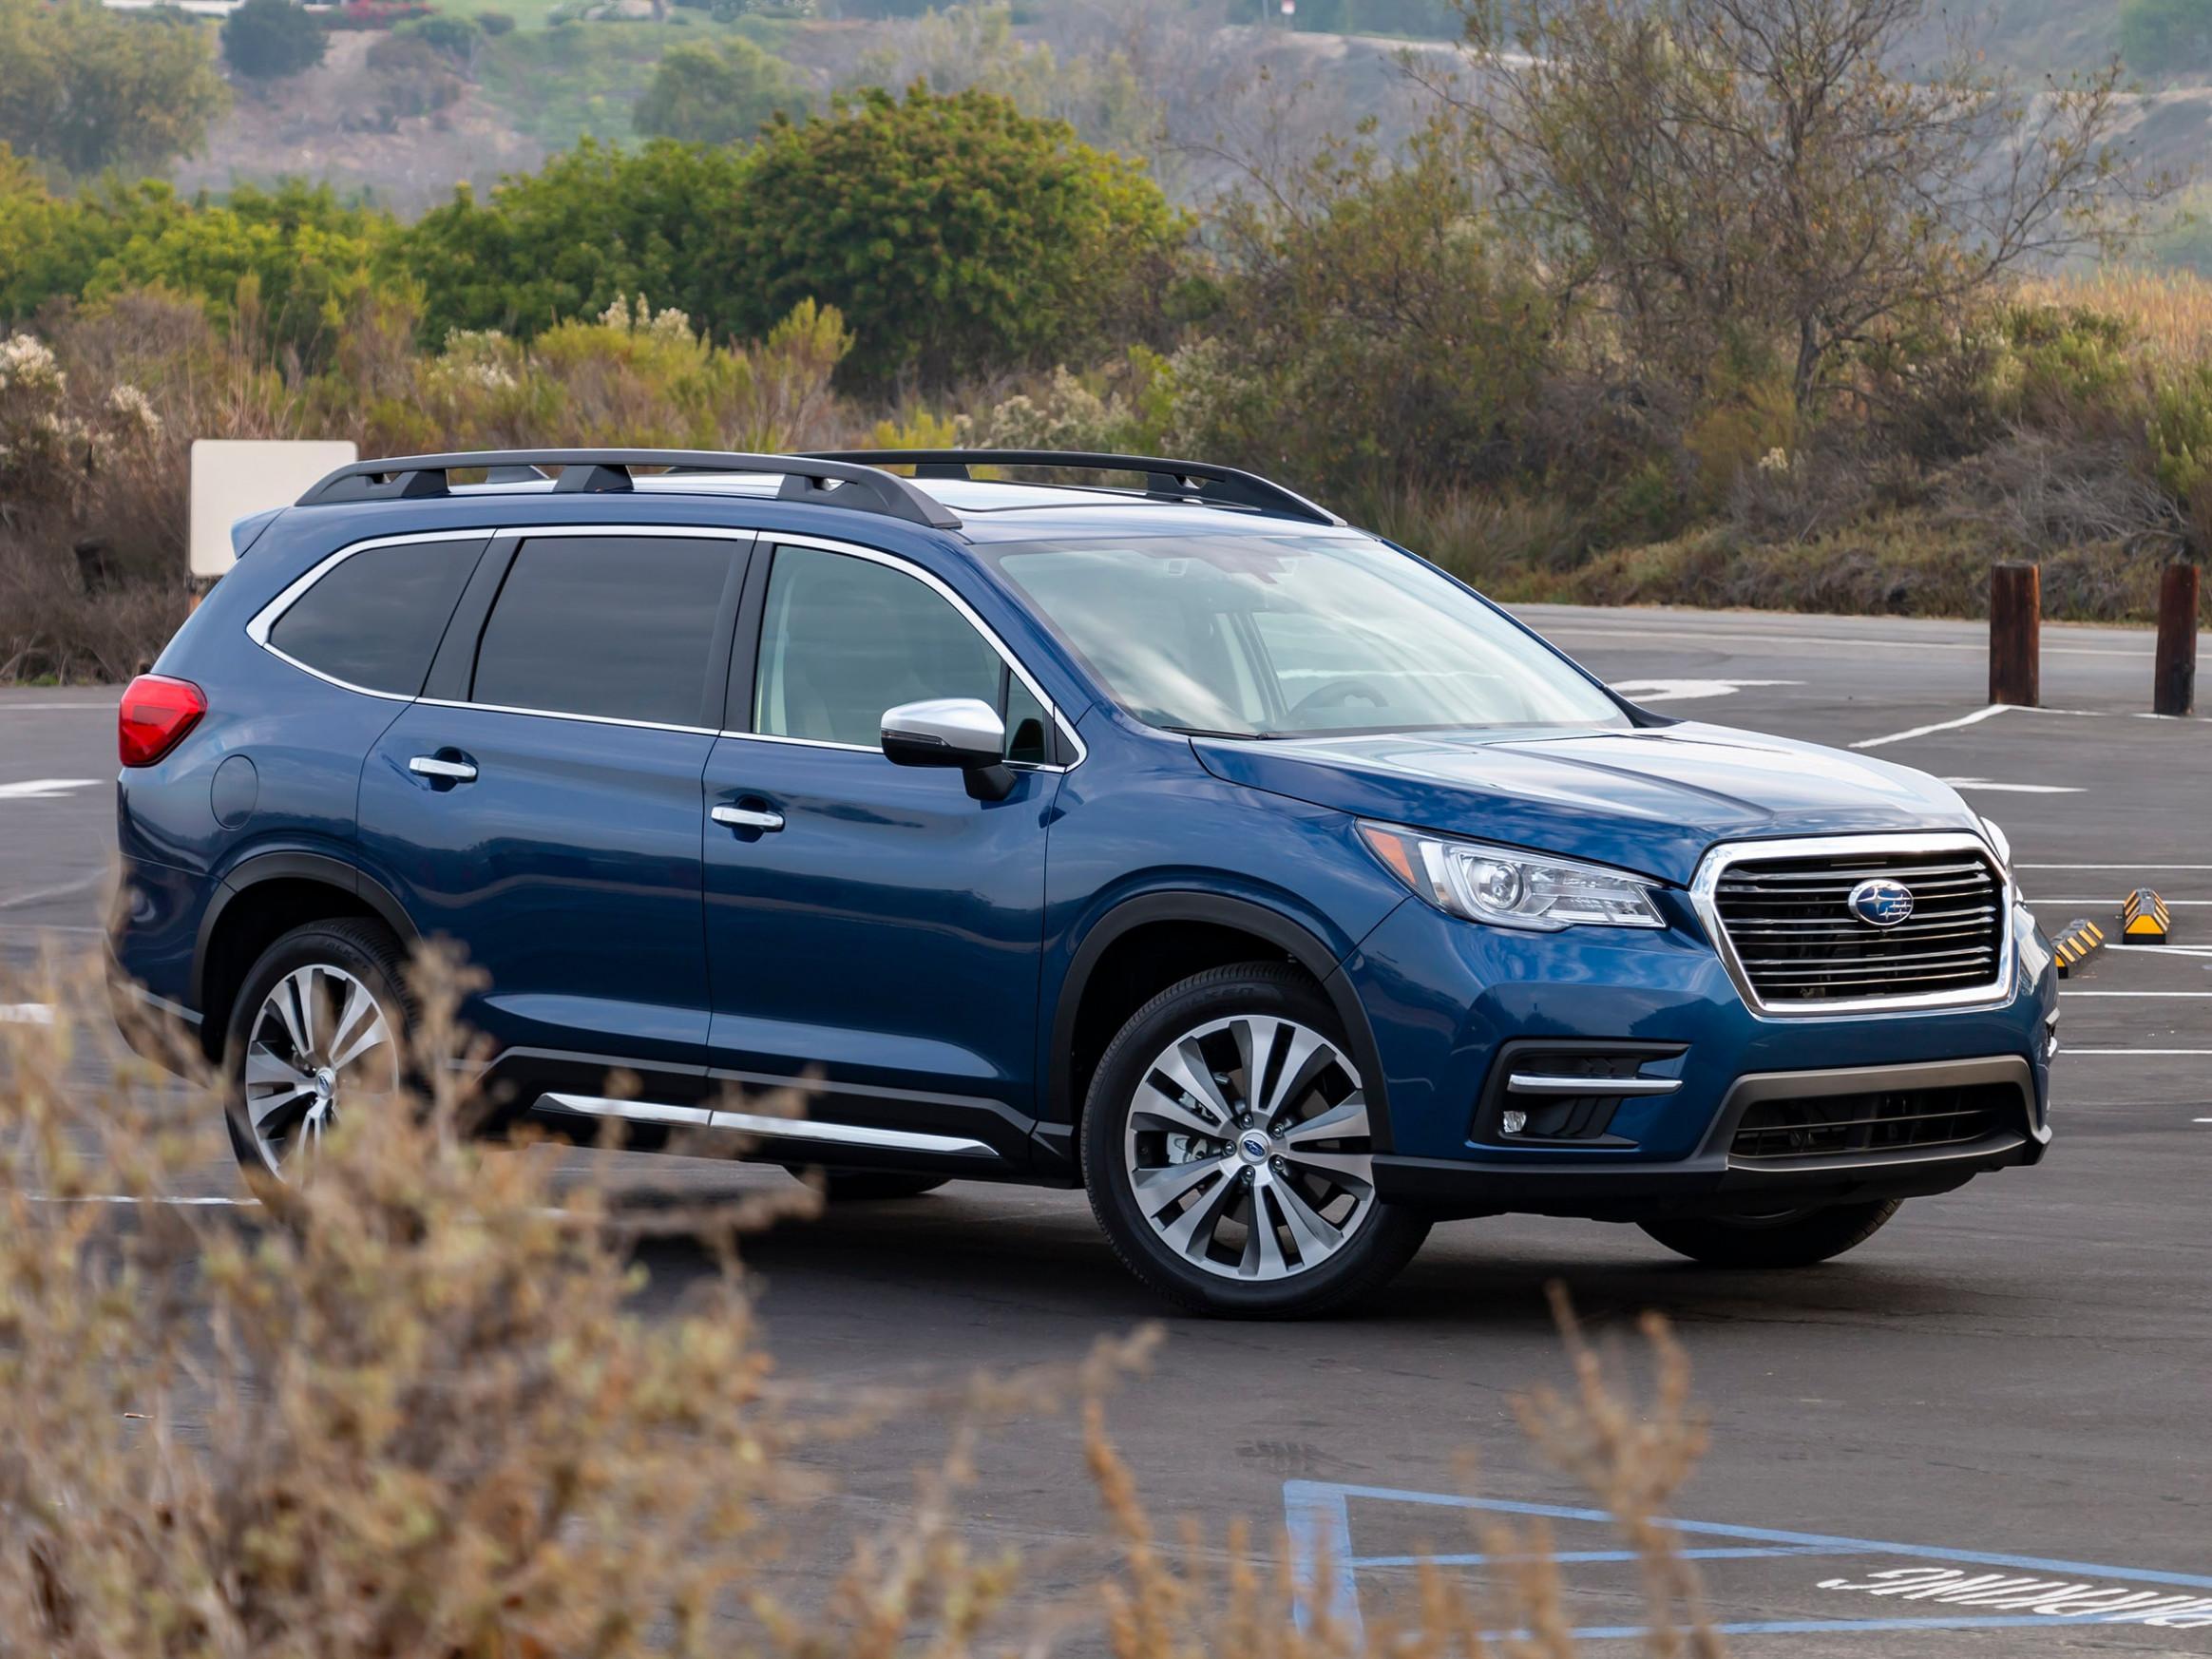 Rumors 2022 Subaru Ascent Release Date